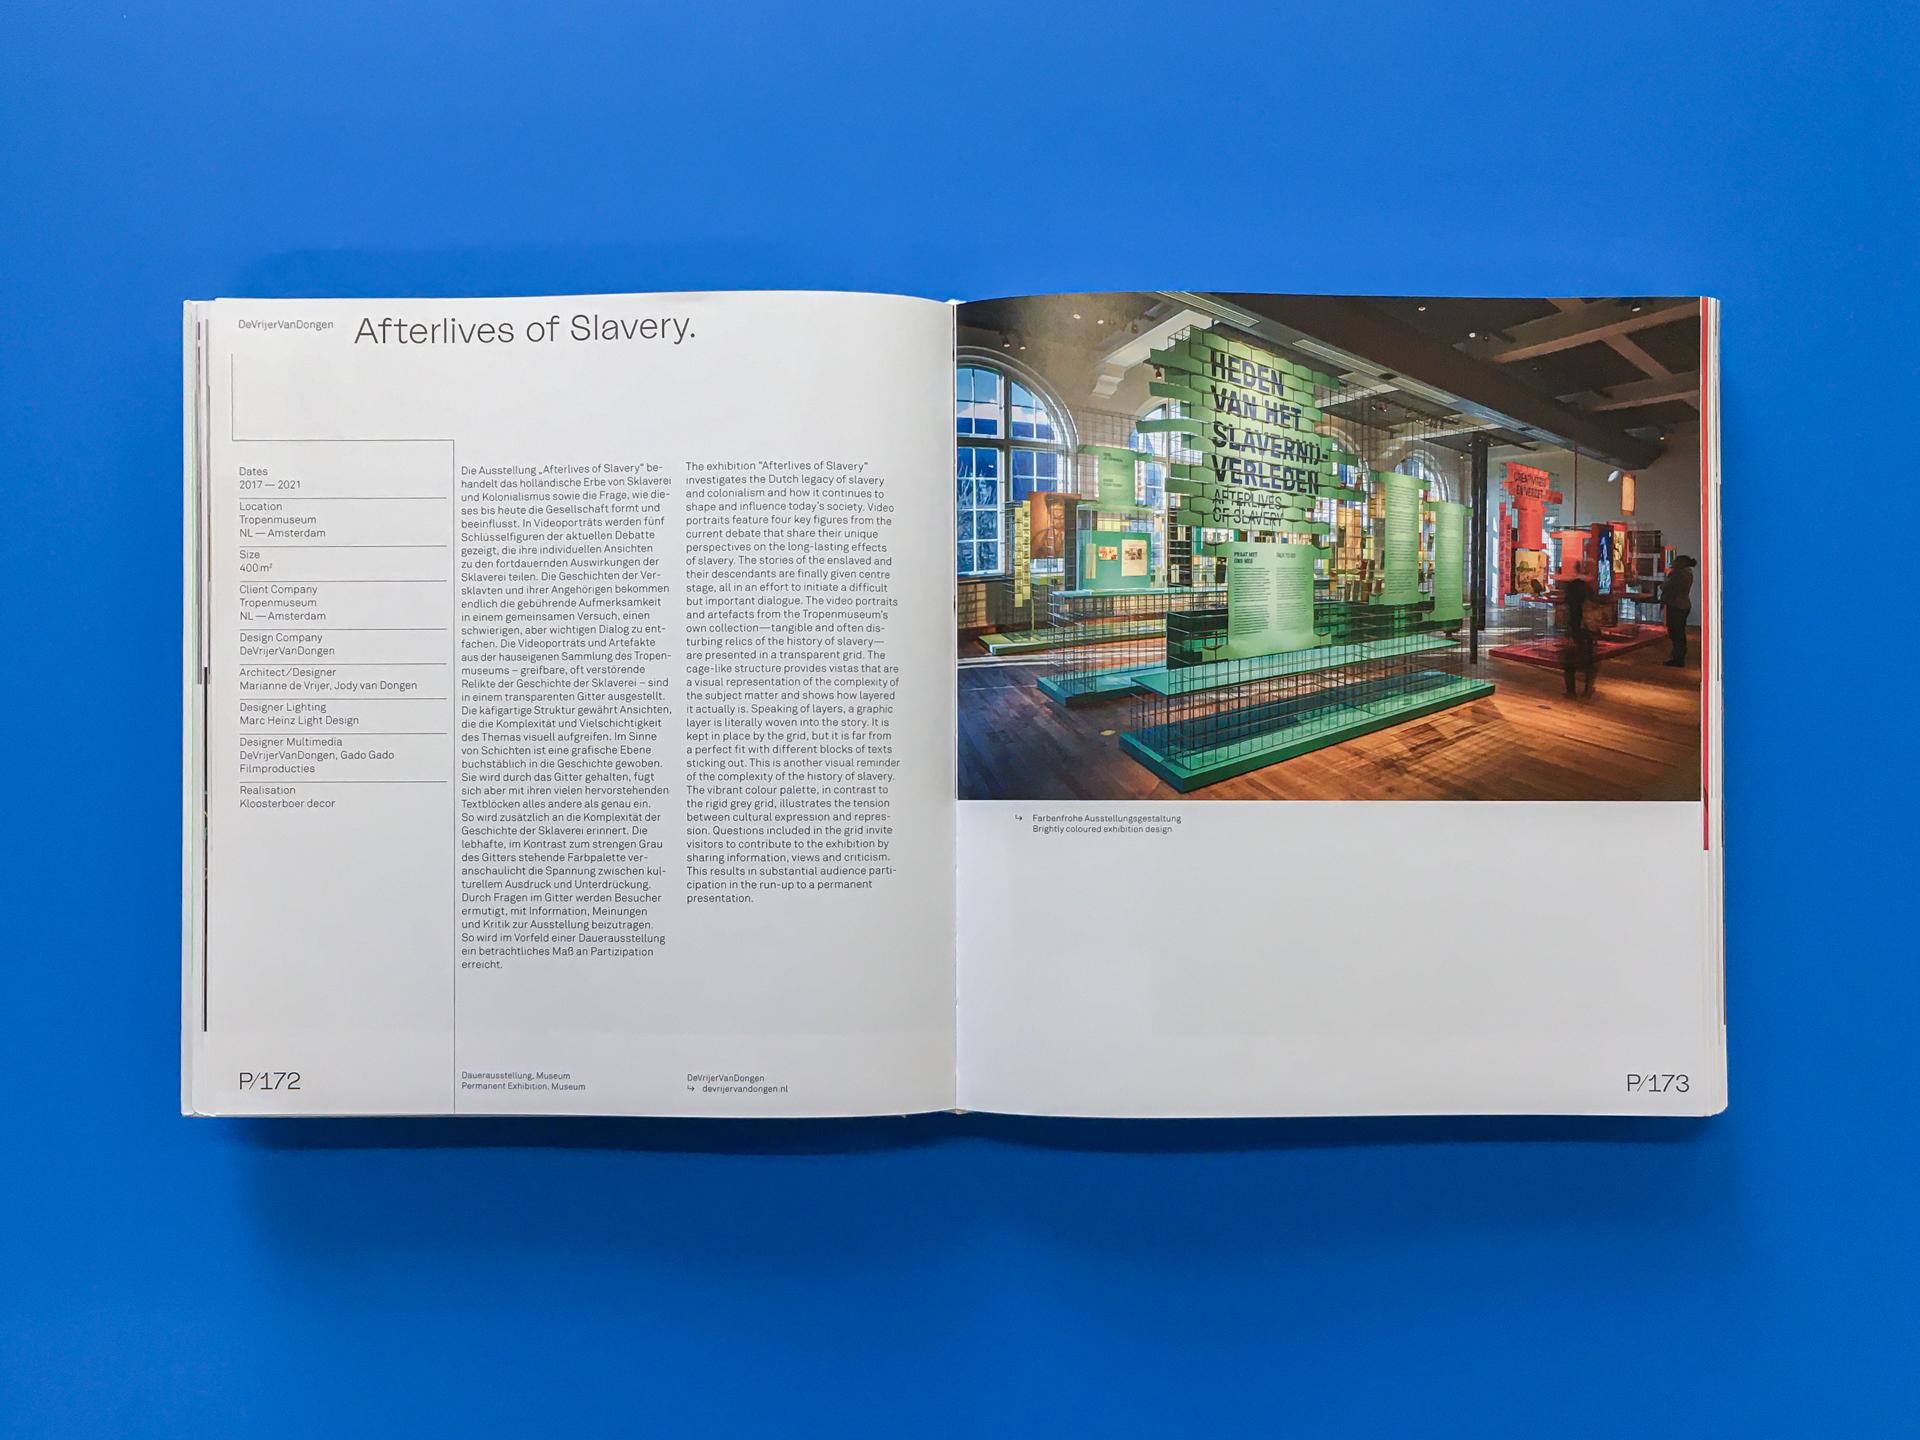 dvvd tm new exhibition design 03 book 2 1 jpg